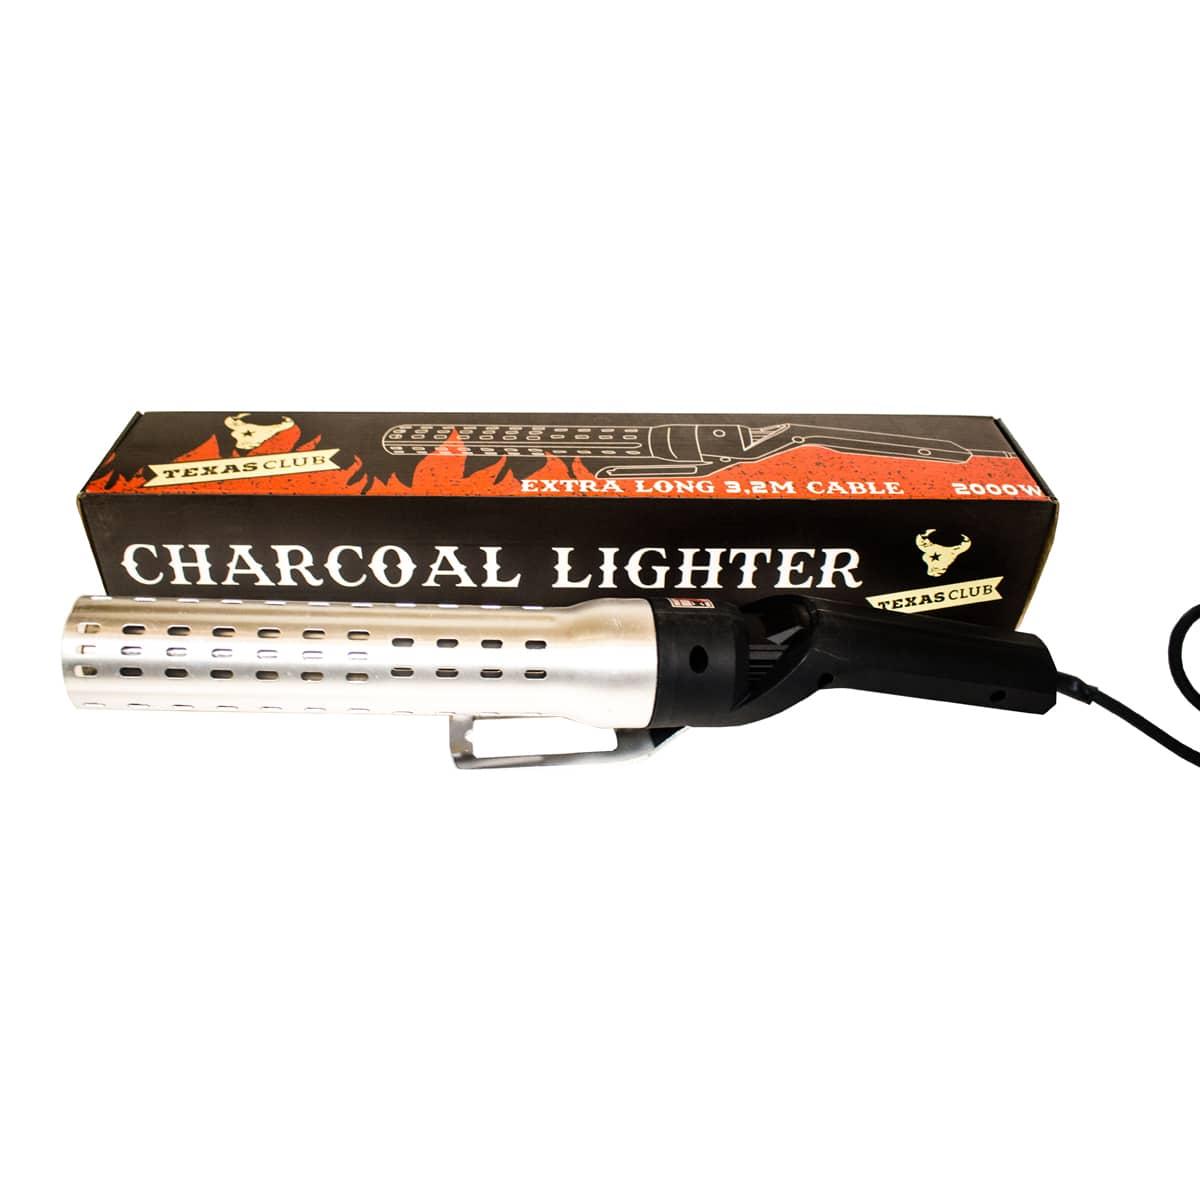 Texas Club LIGHTER, electric lighter.